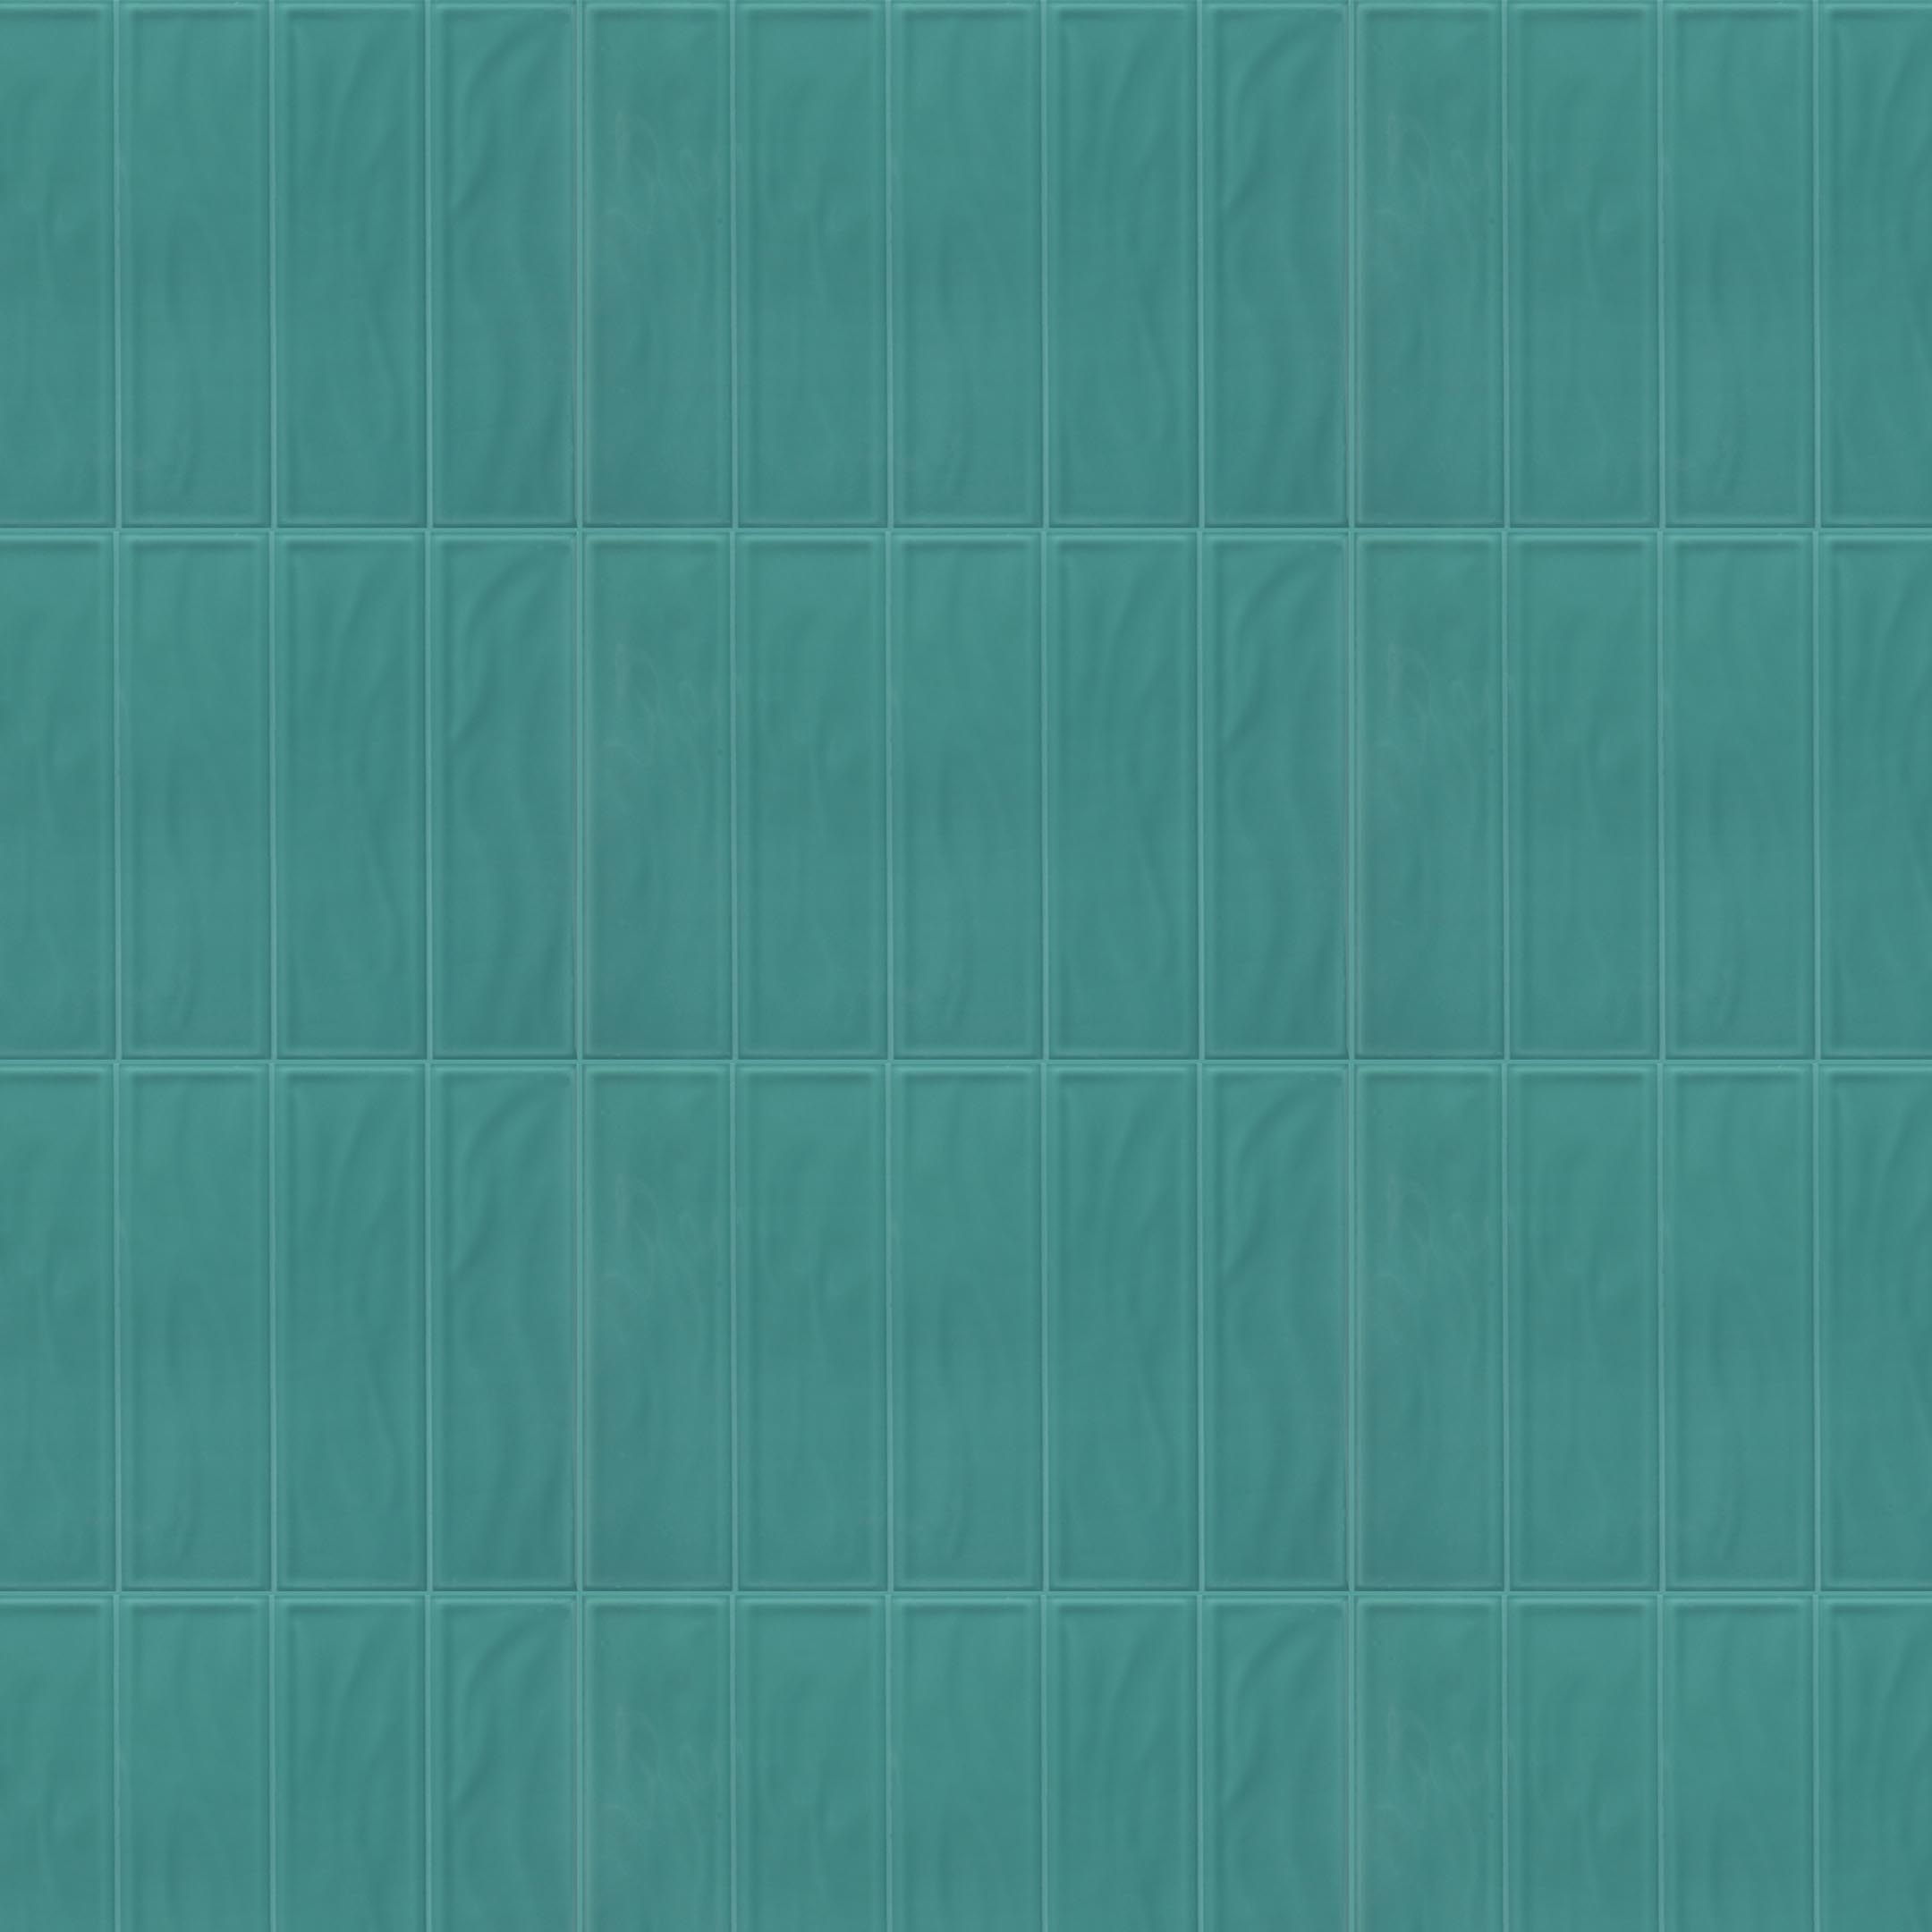 Плитка облицовочная Керамин Метро 4Т зеленый 275x400x7,5 мм (15 шт.=1,65 кв.м) фото